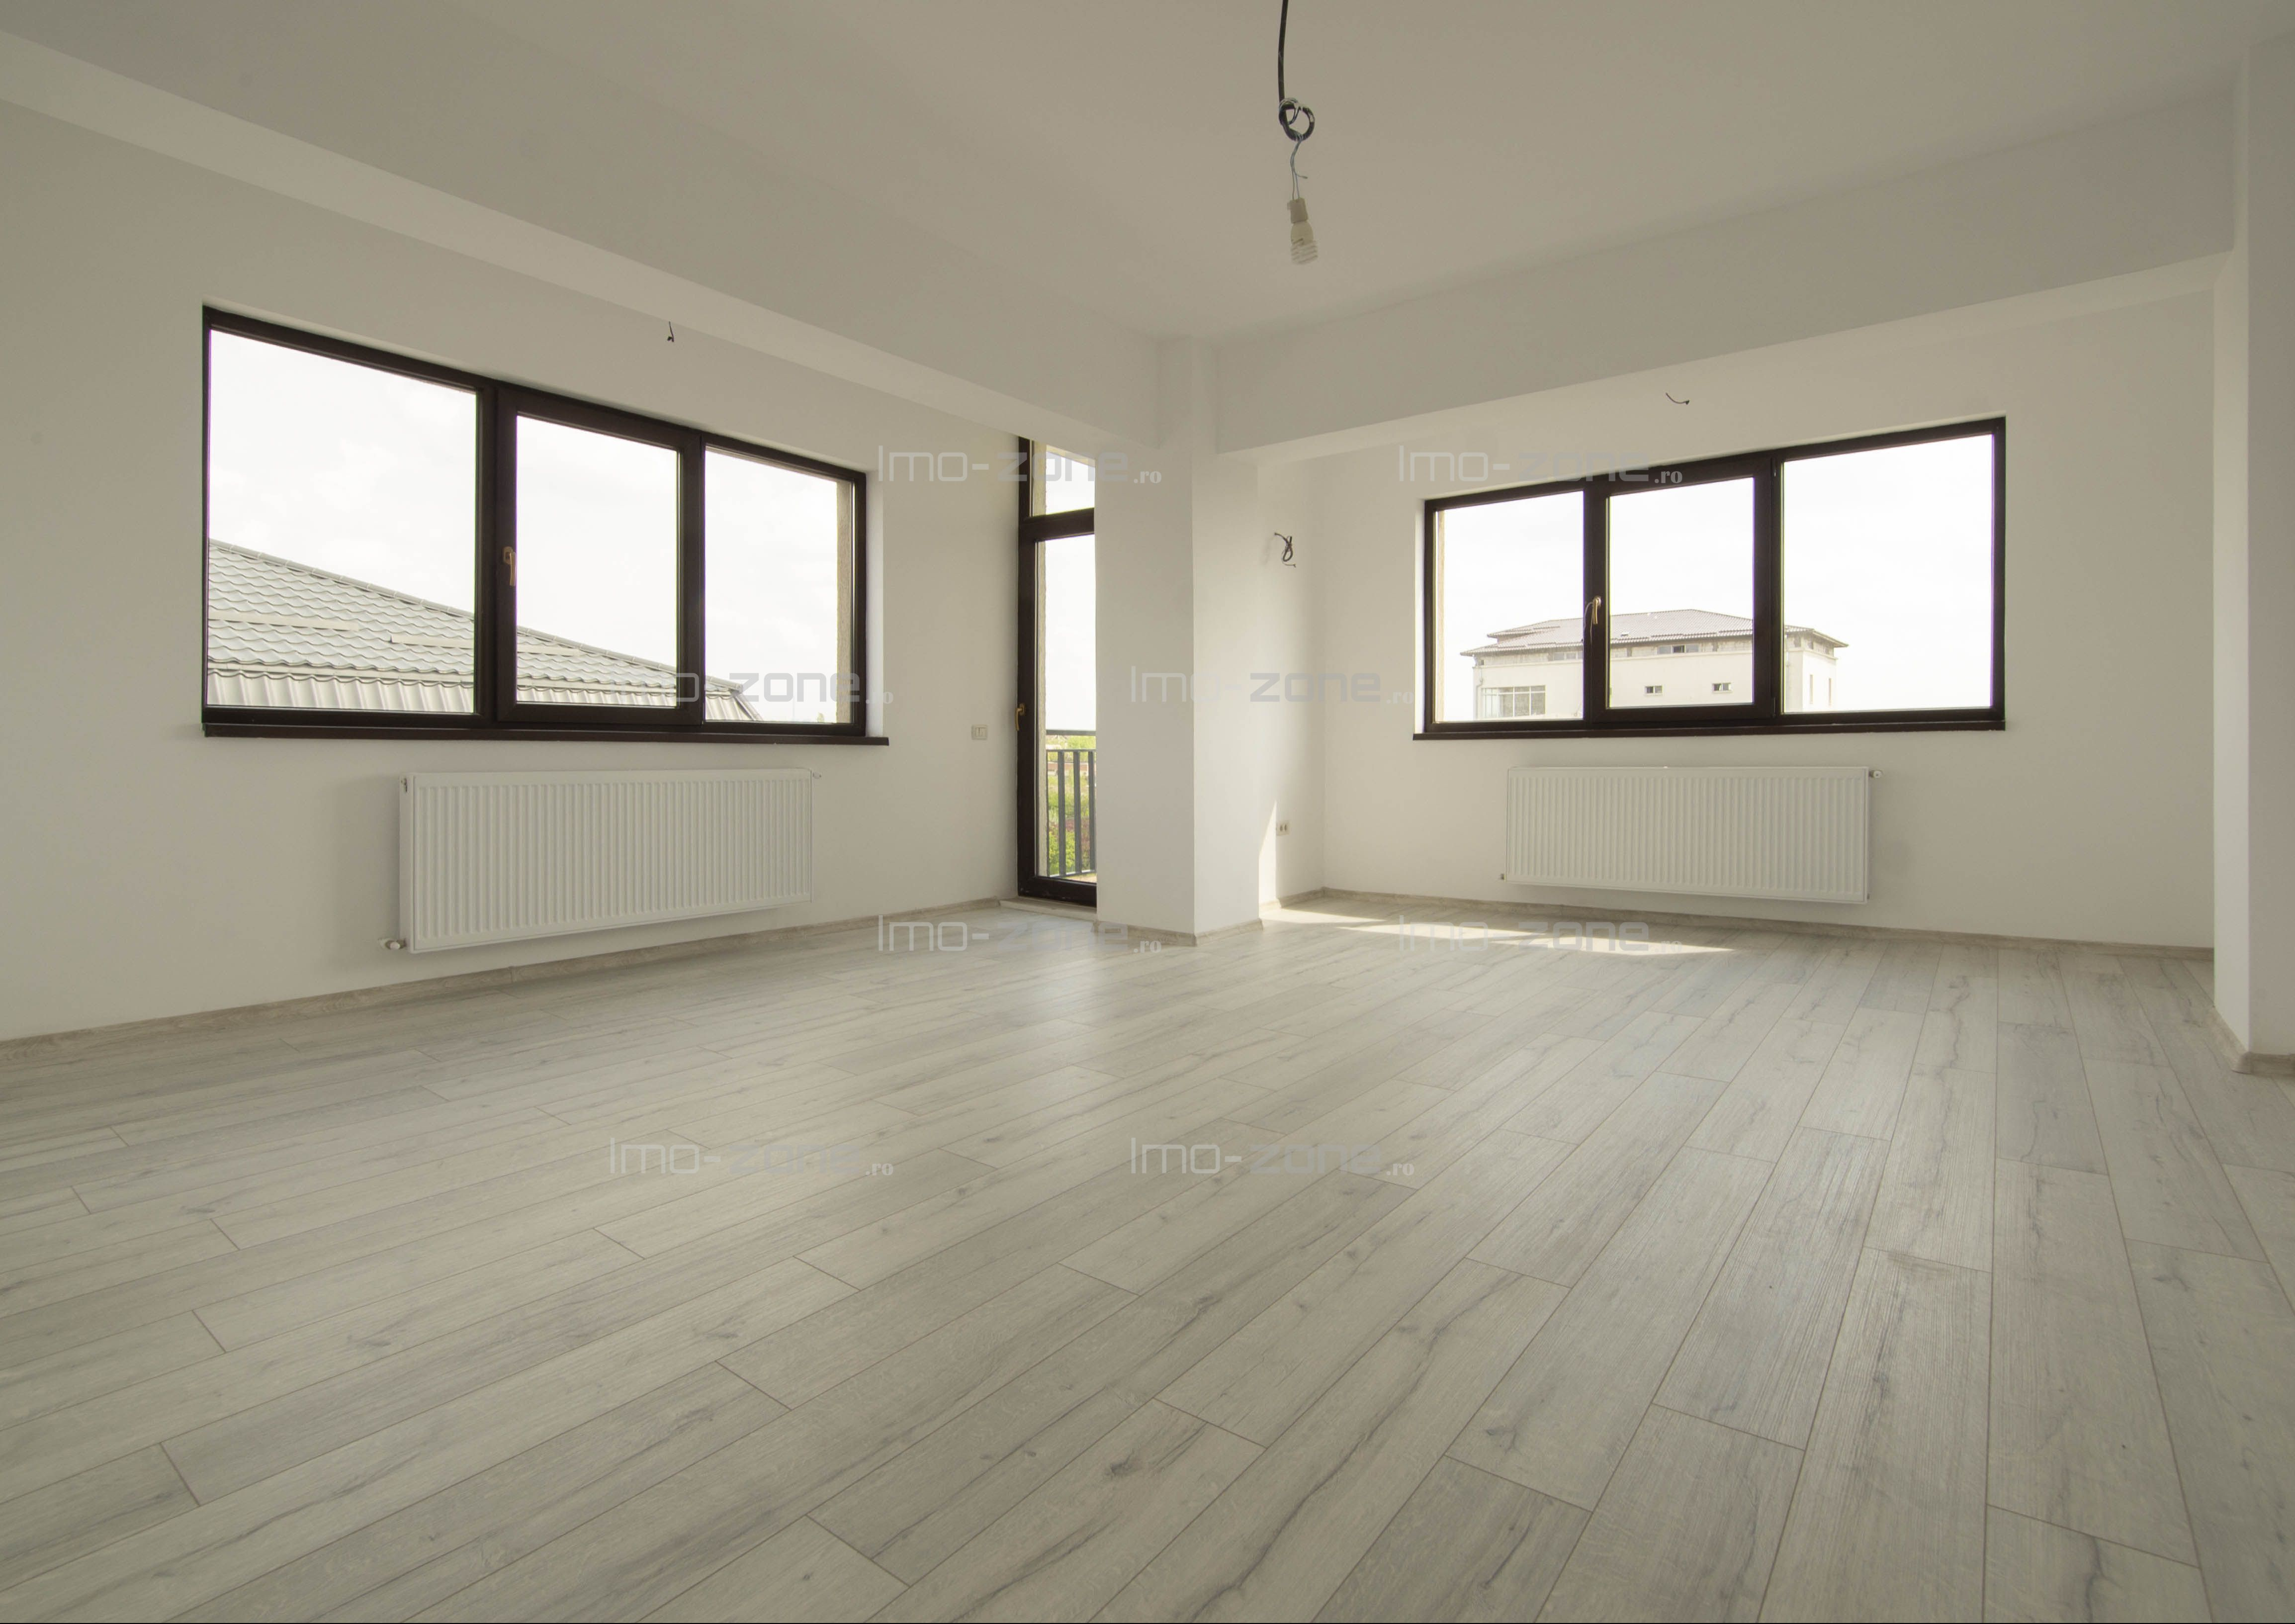 Apartament 2 camere, 63 mp, finalizat, Drumul Taberei - Funigeilor, comision 0%